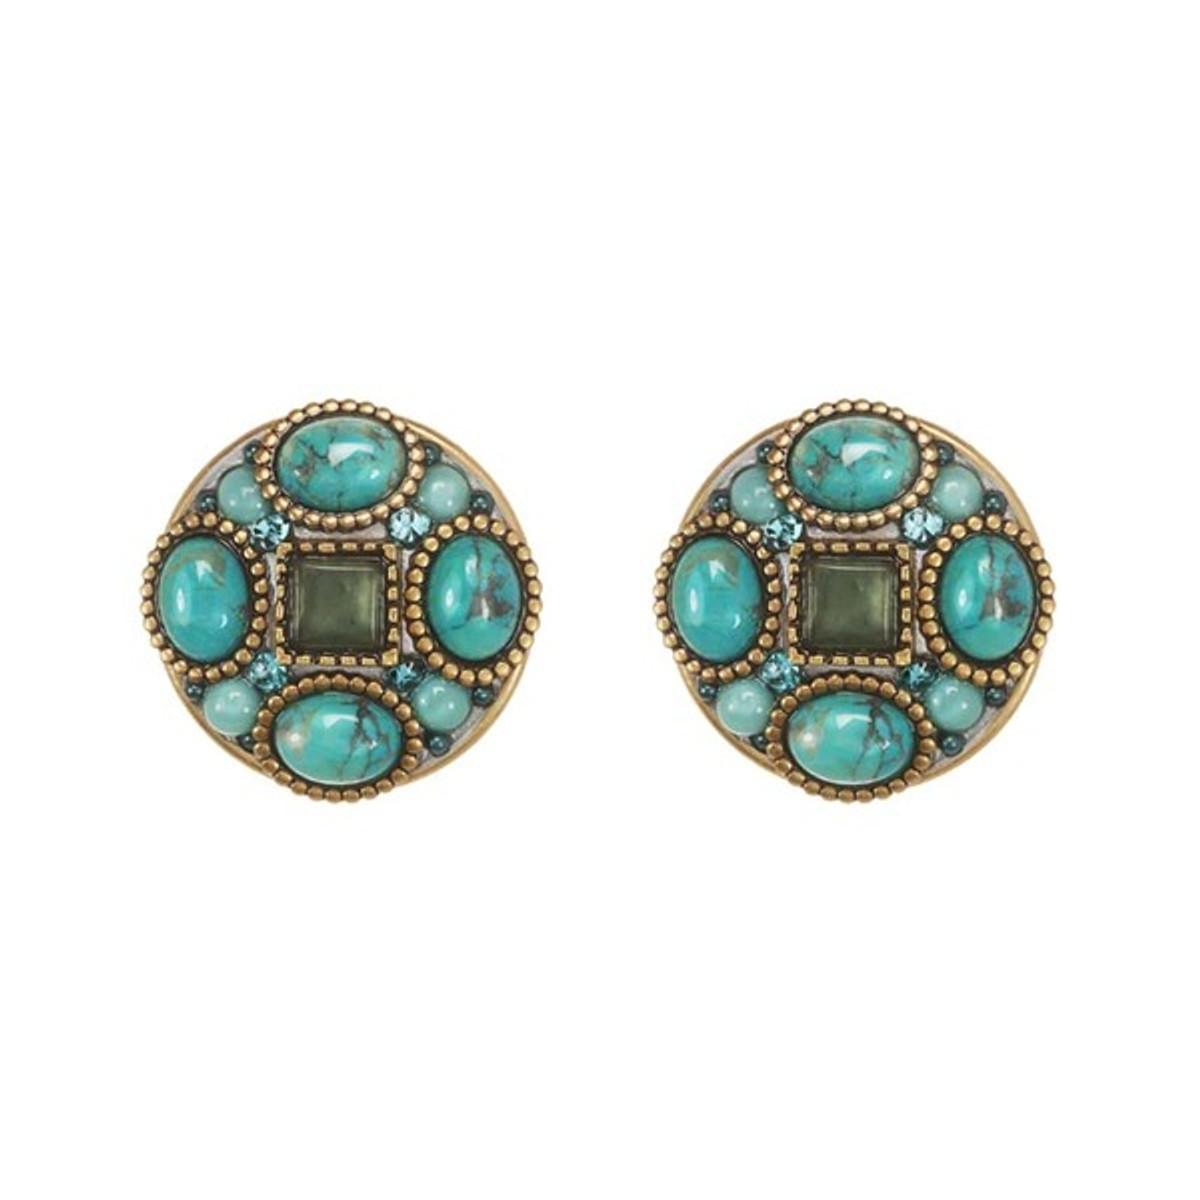 Michal Golan Earring Nile - Turquoise